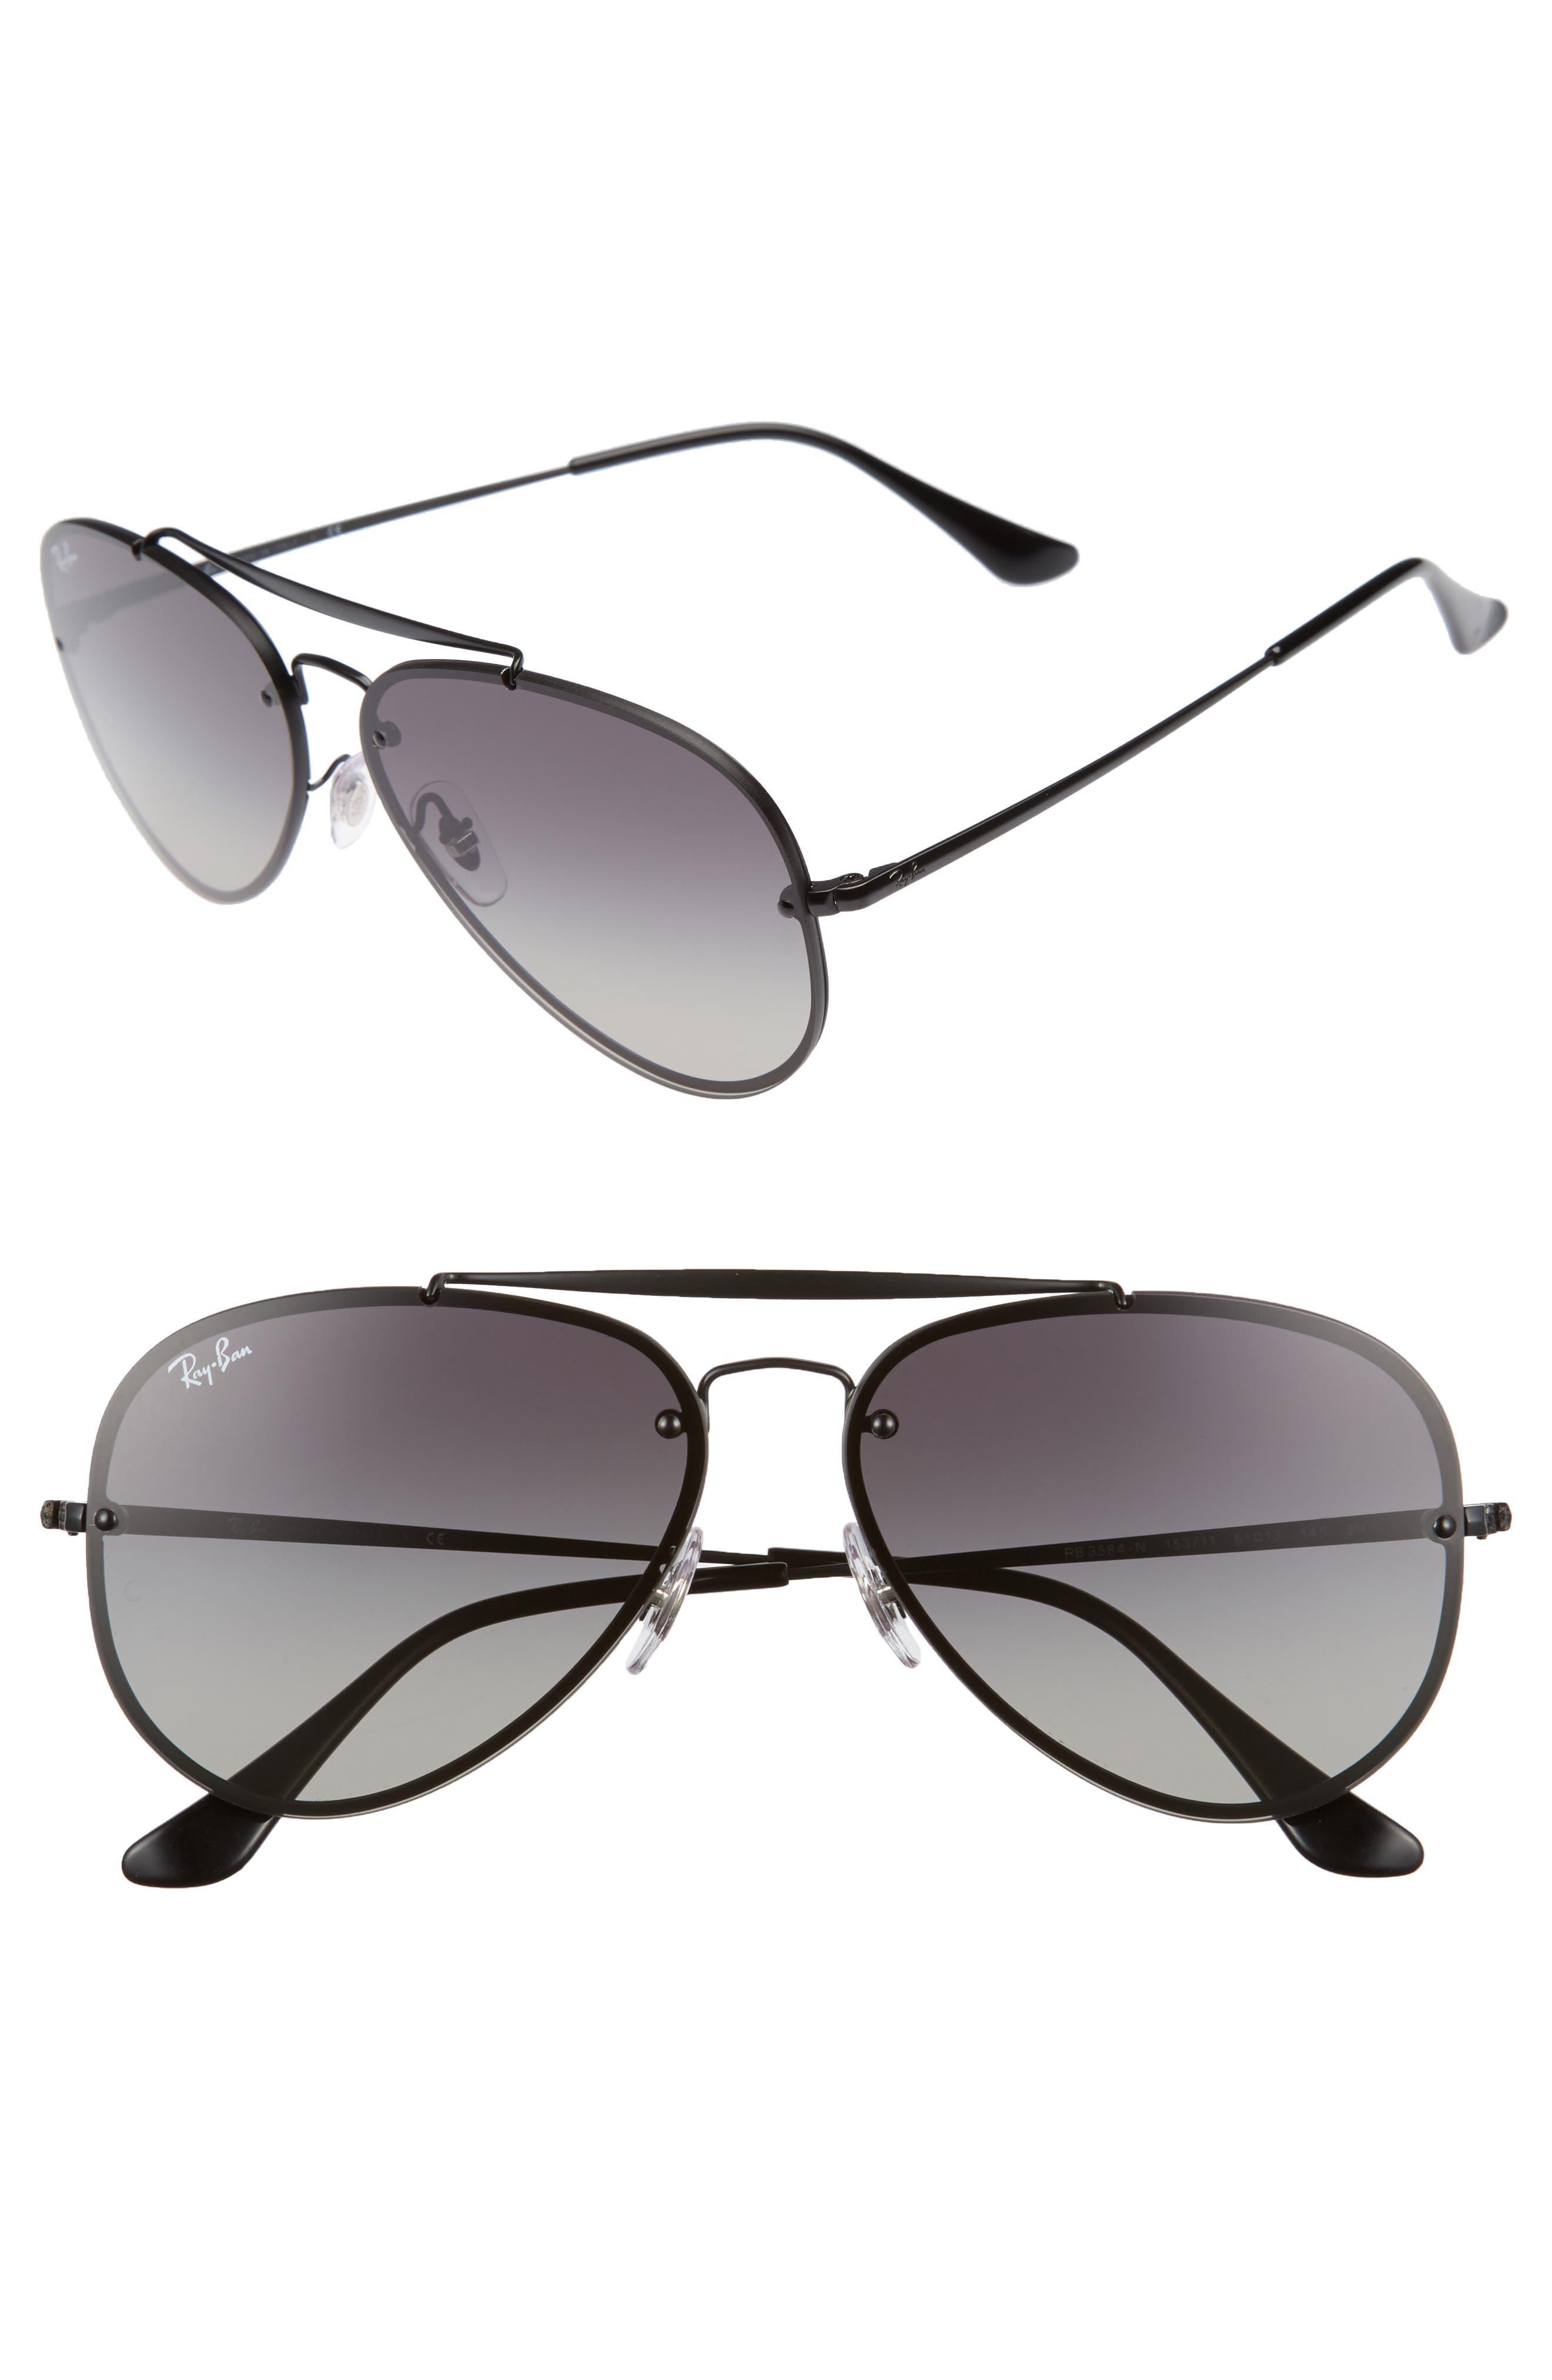 Ray-Ban 61Mm Gradient Lens Aviator Sunglasses - Shiny Black